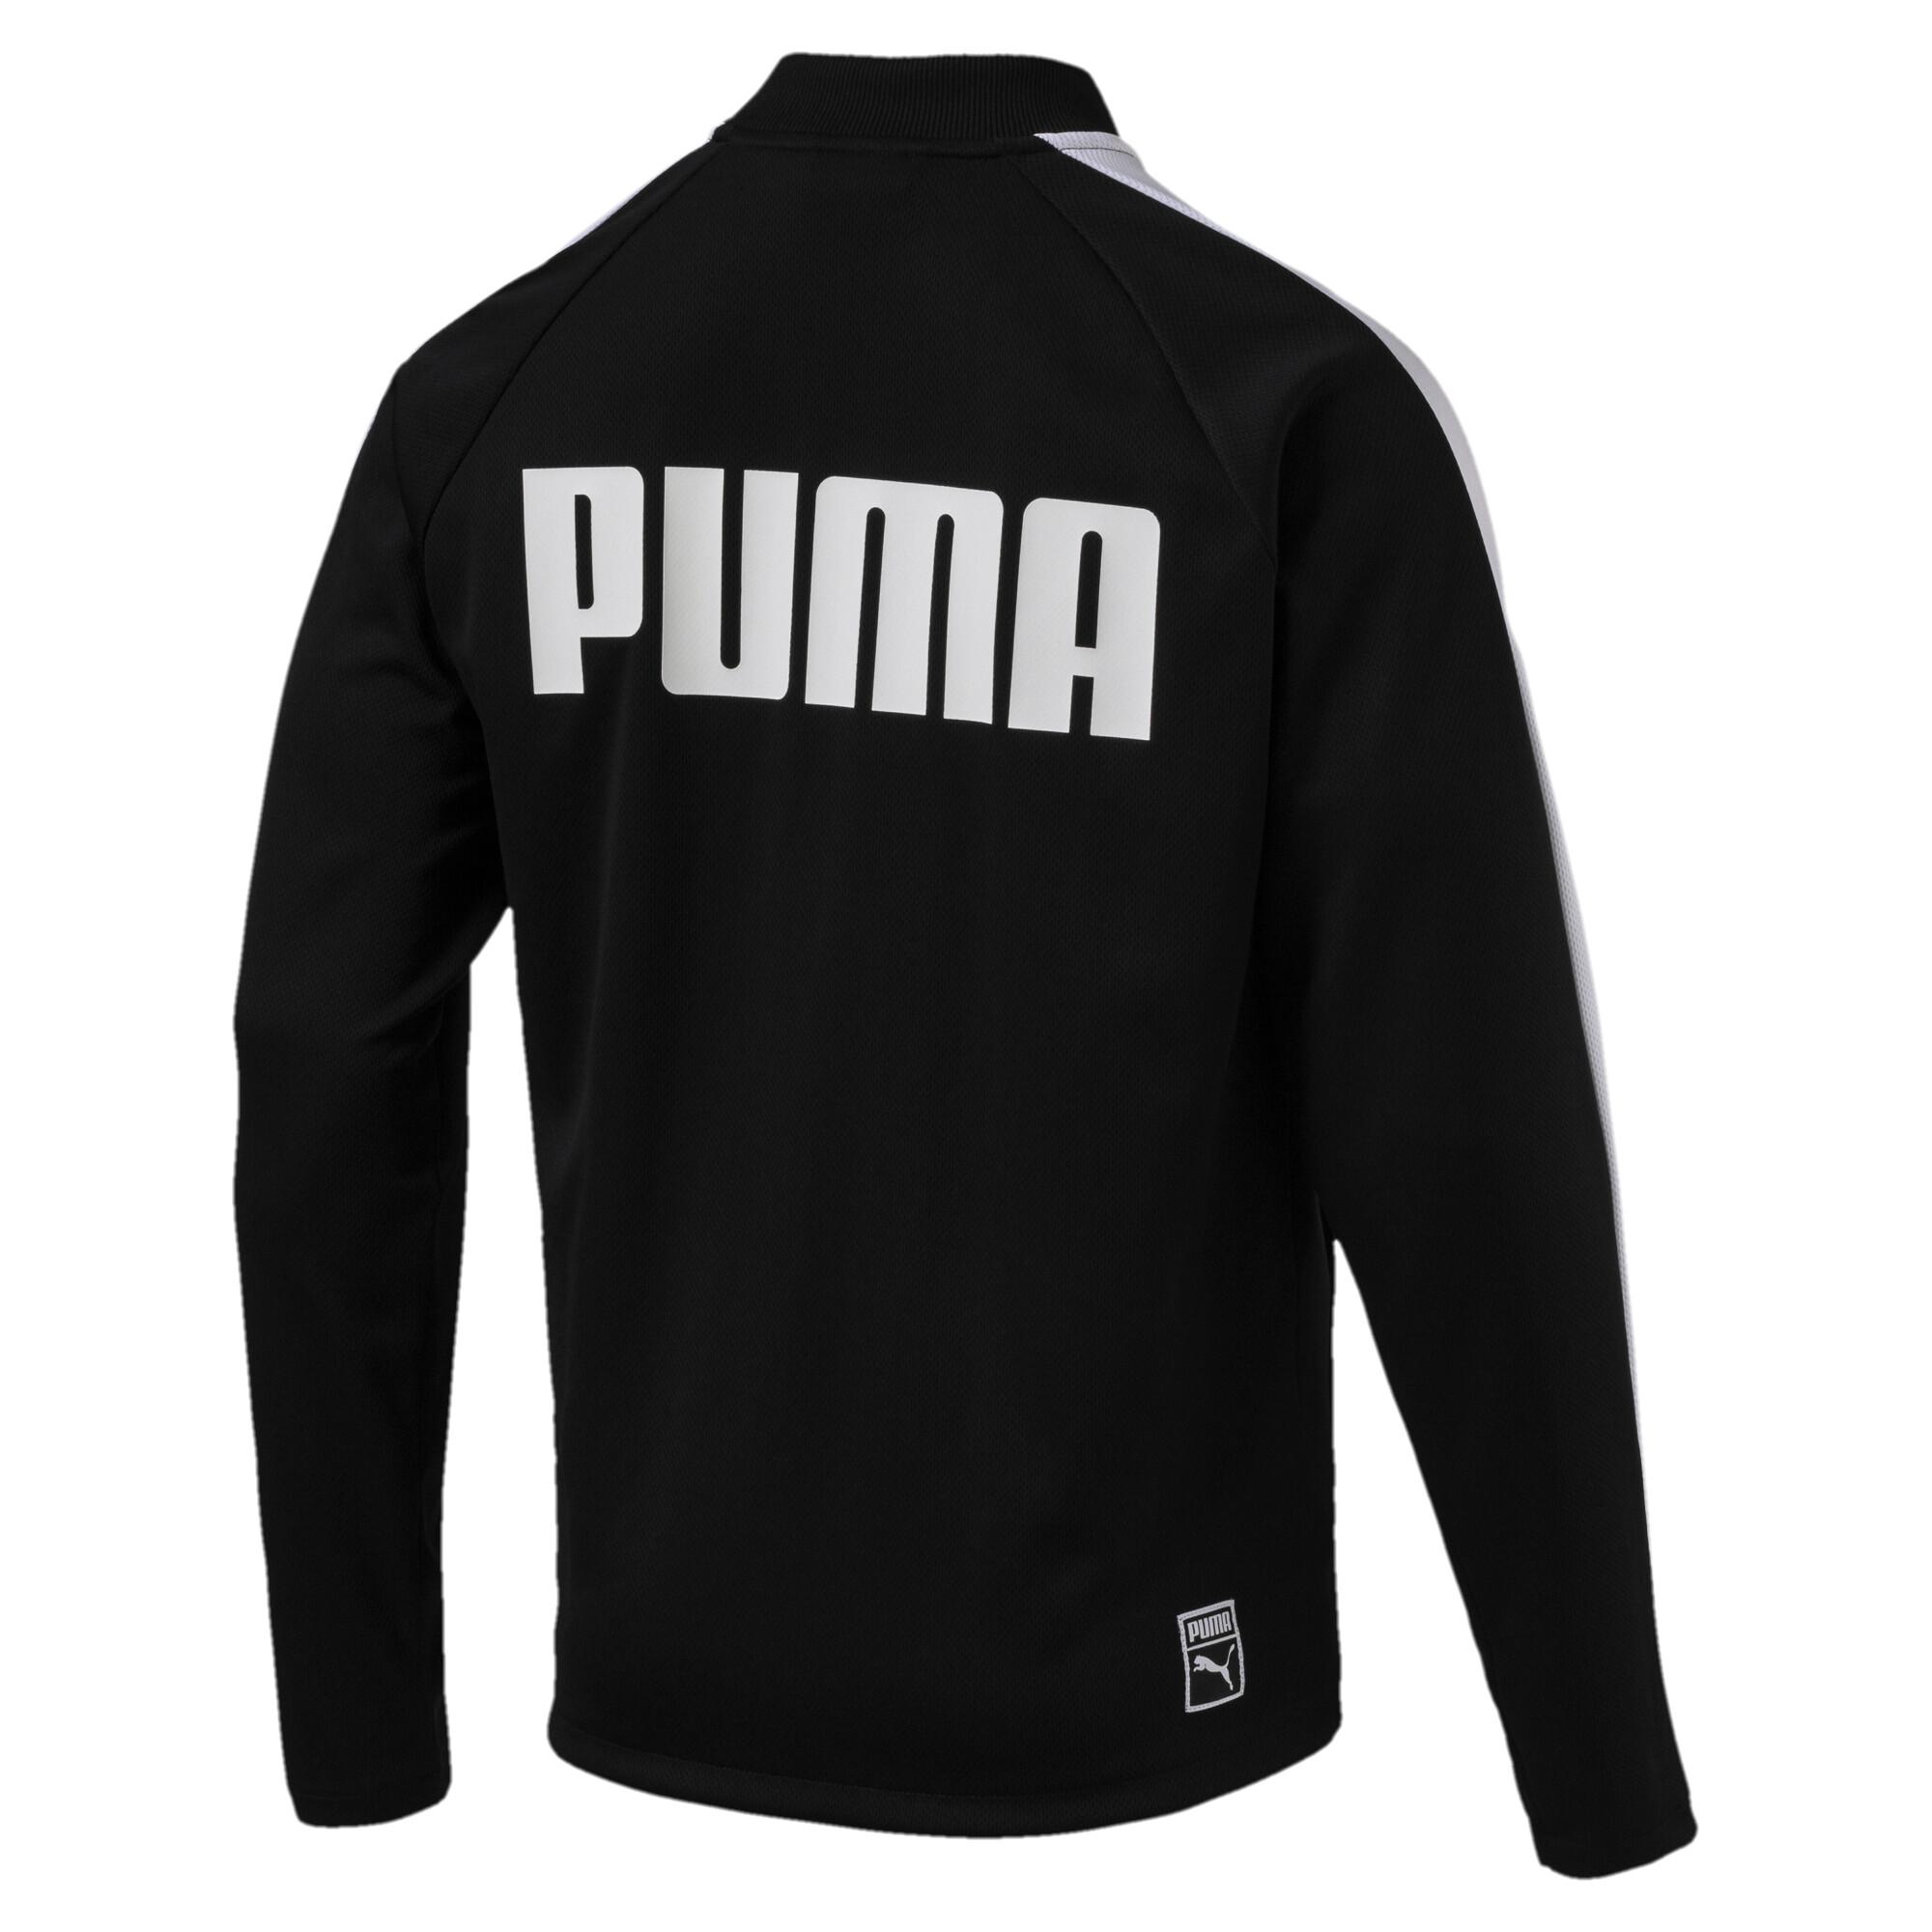 Indexbild 3 - PUMA Archive Herren T7 Summer Jacke Männer Trainingsjacke Sport Classics Neu